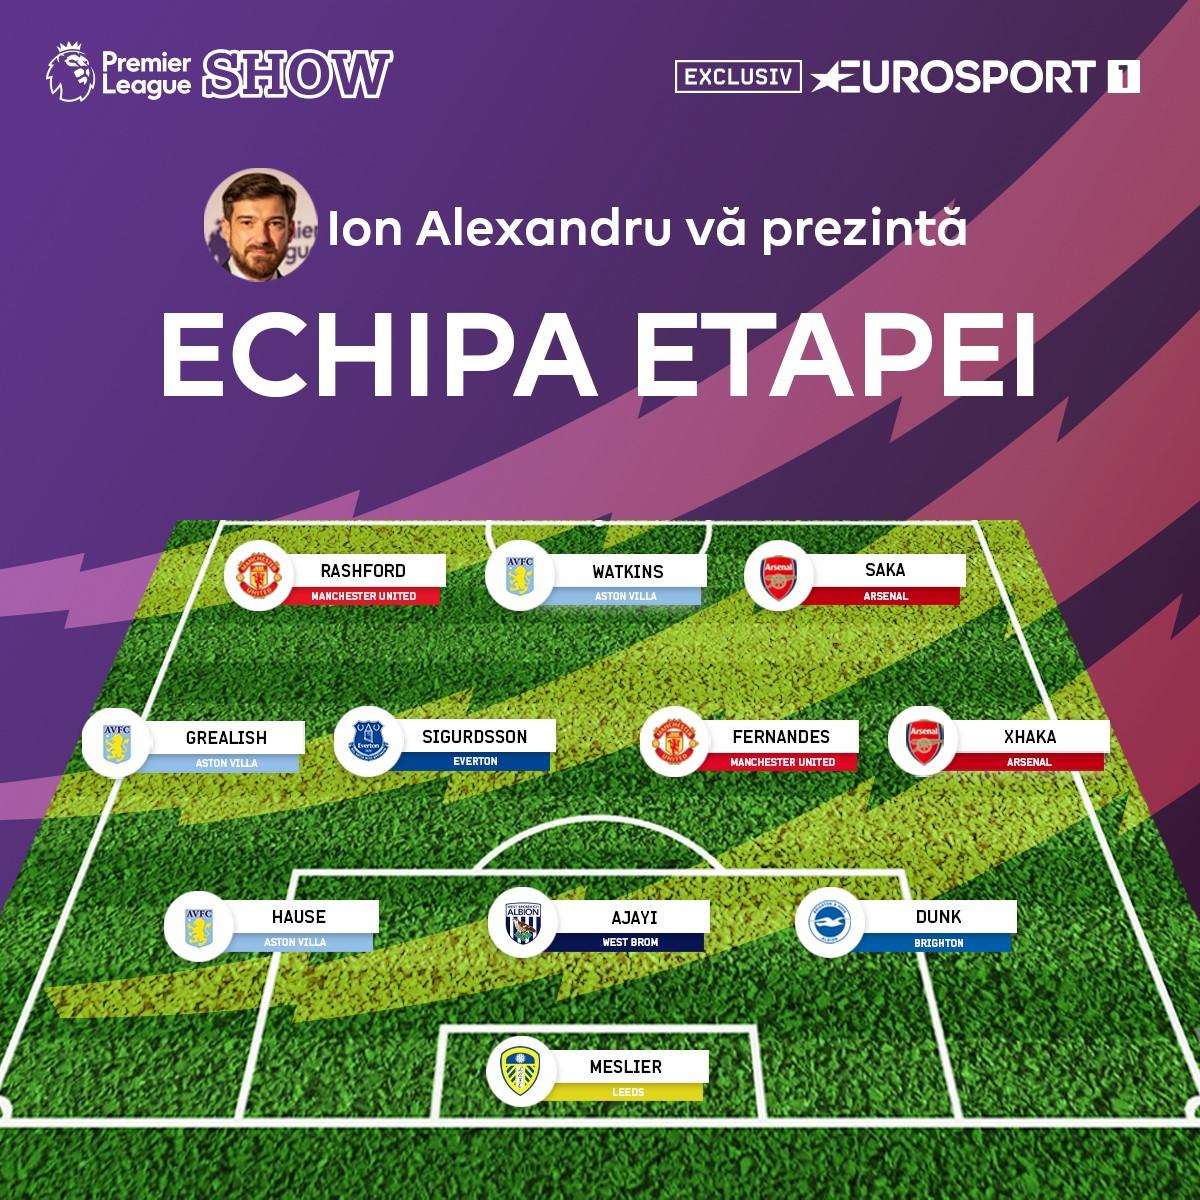 https://i.eurosport.com/2020/12/28/2962264.jpg